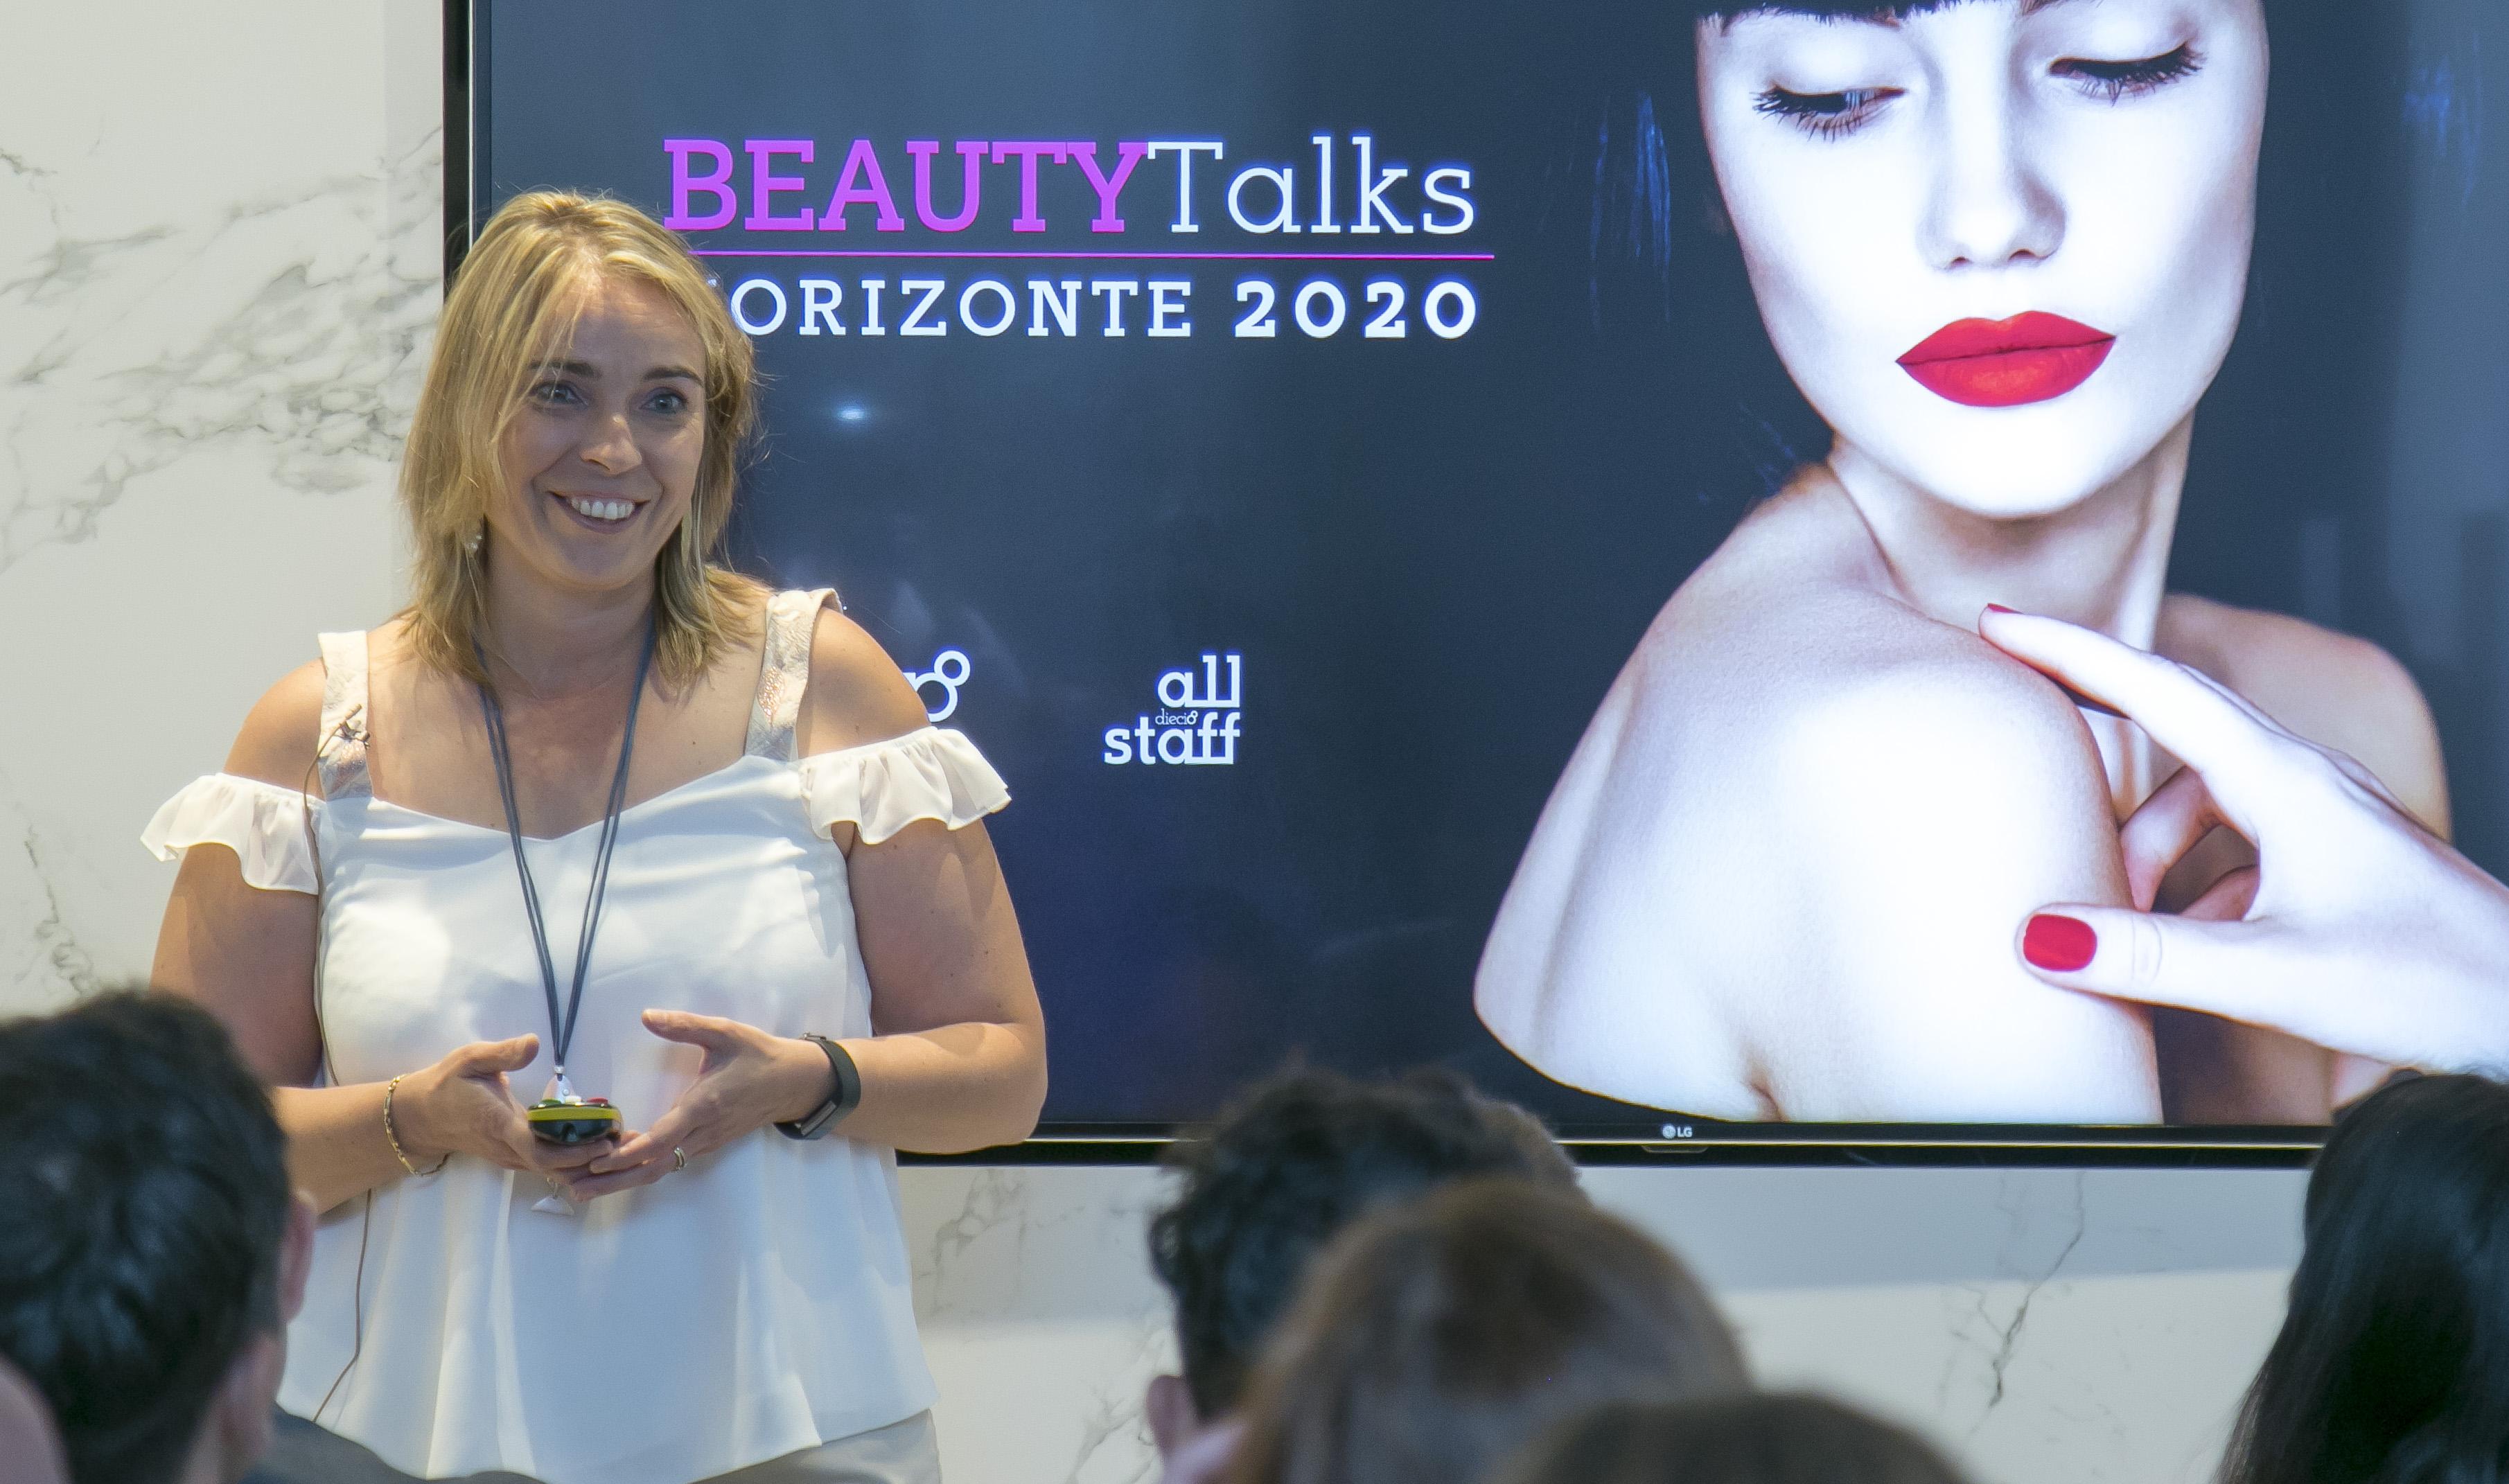 Beauty talks (2)